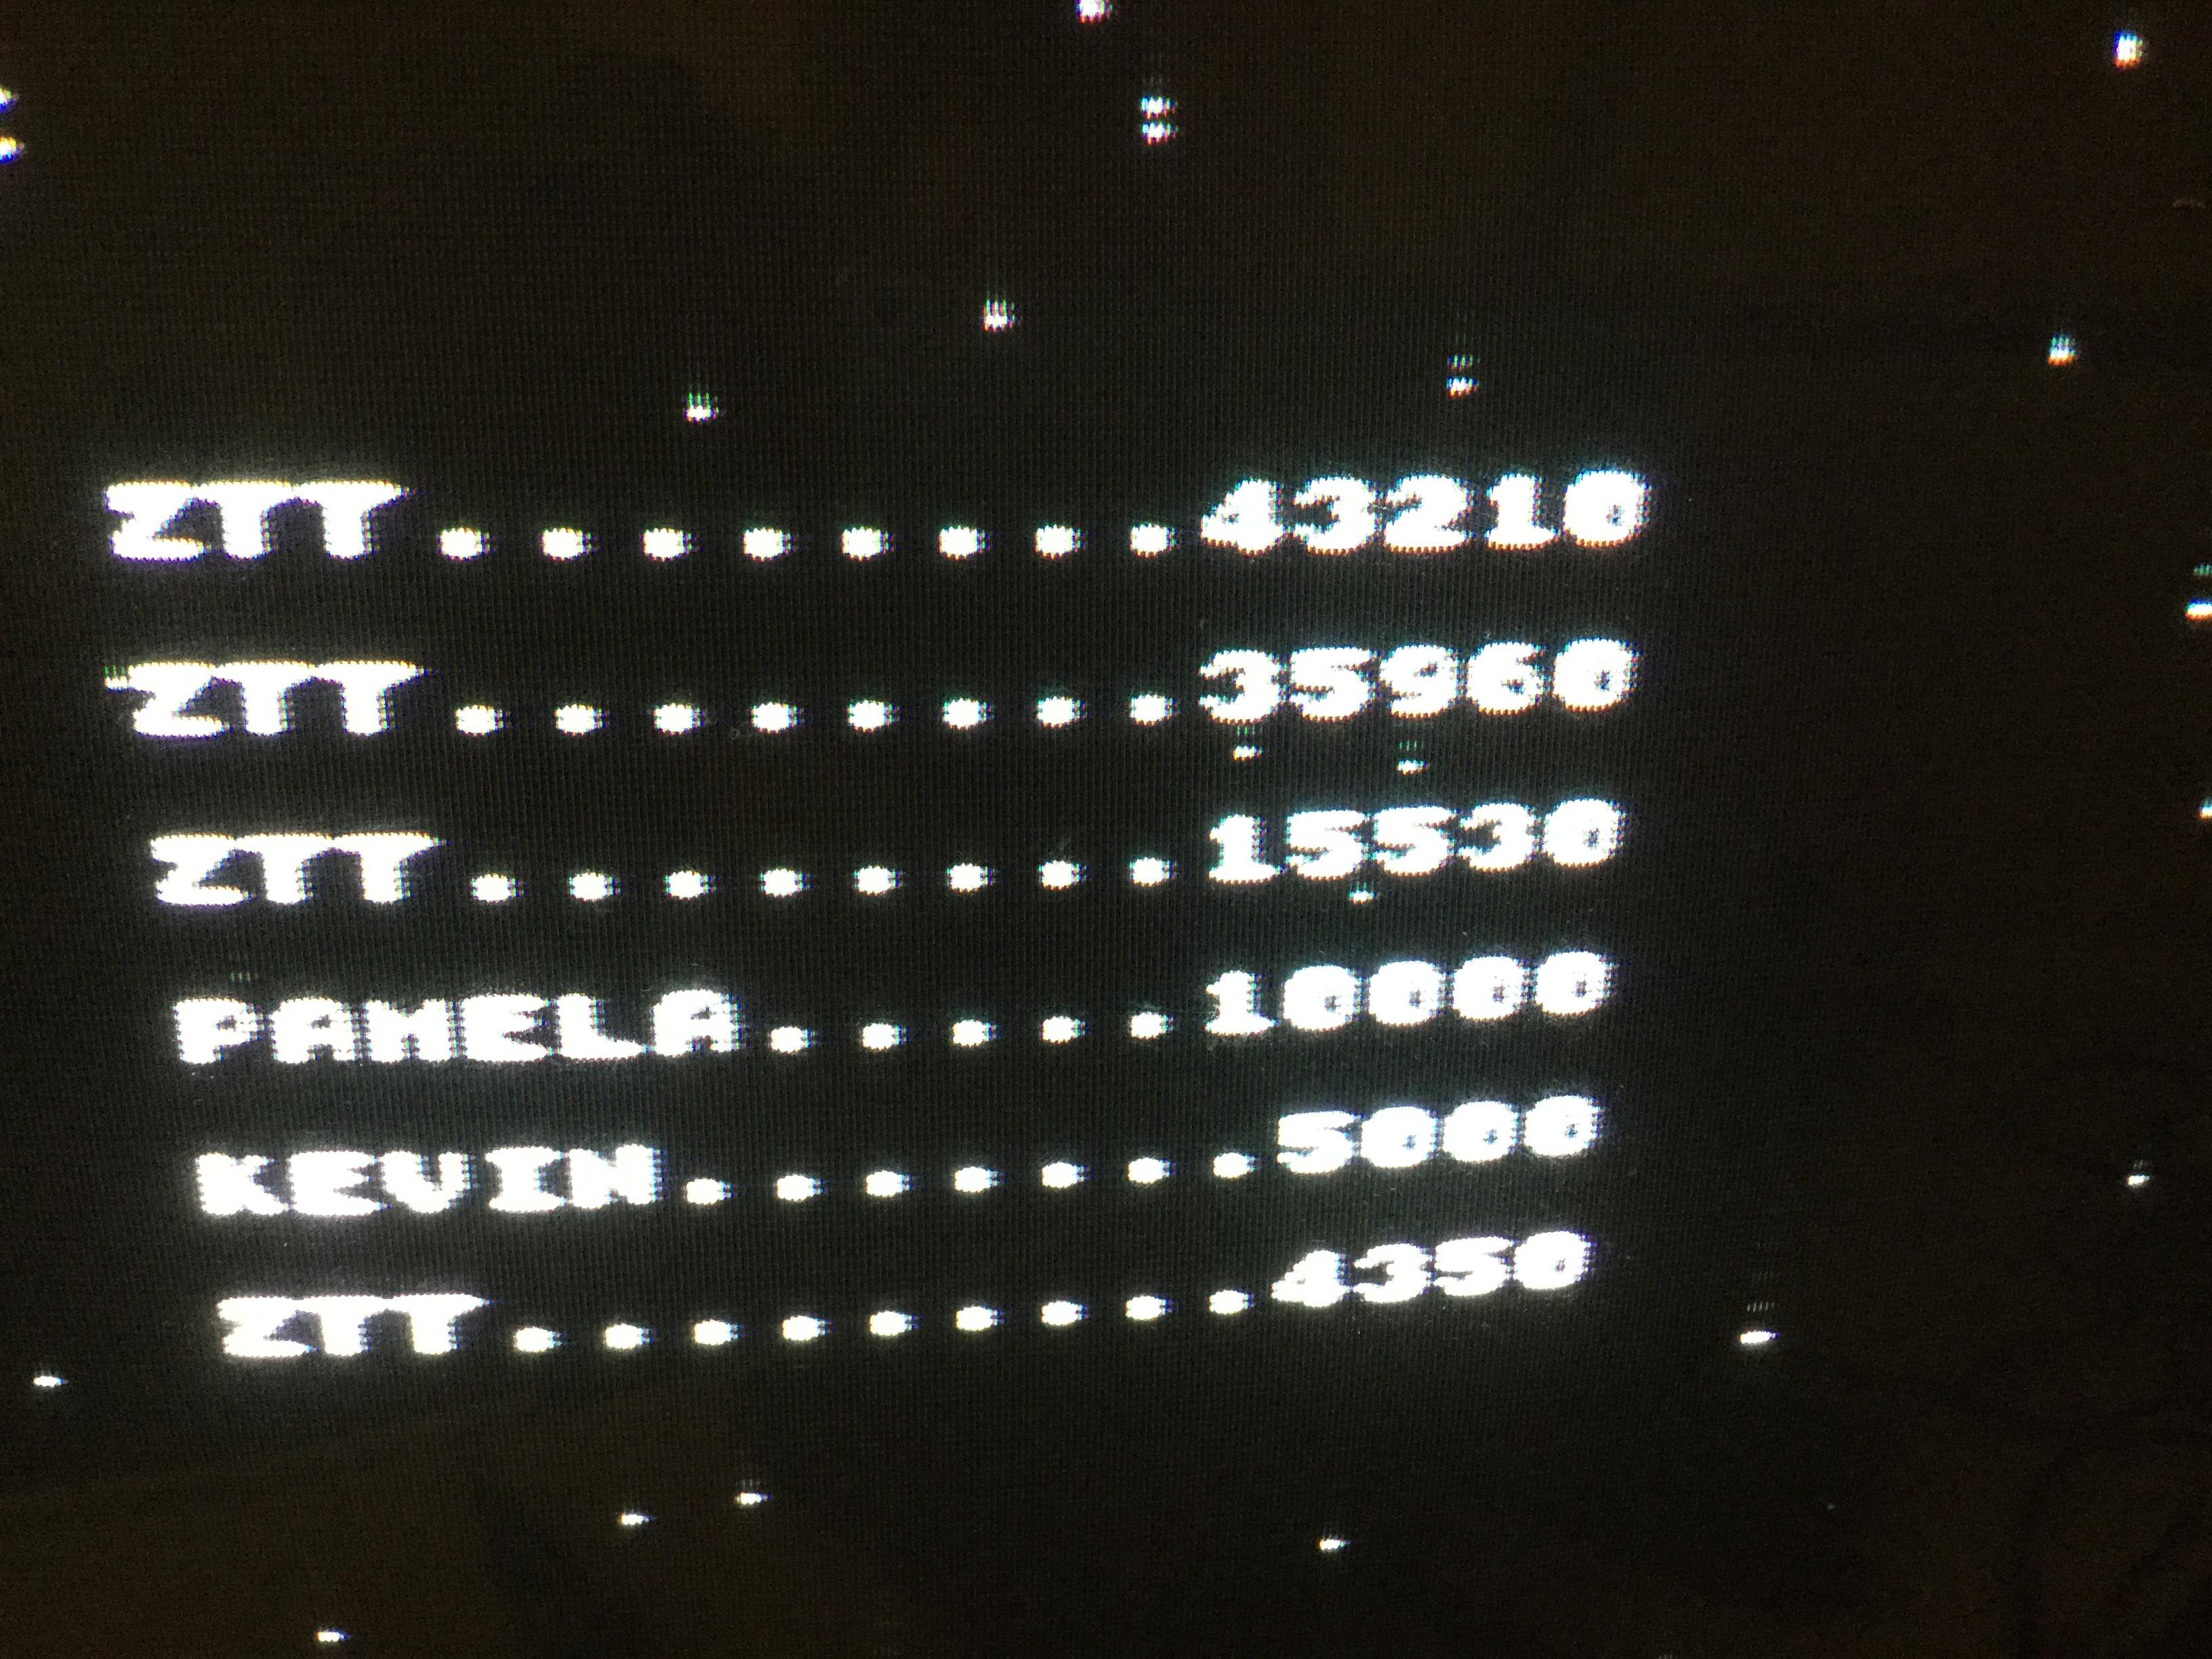 Frankie: Bedlam [Go!] (ZX Spectrum) 43,210 points on 2017-12-23 08:26:47